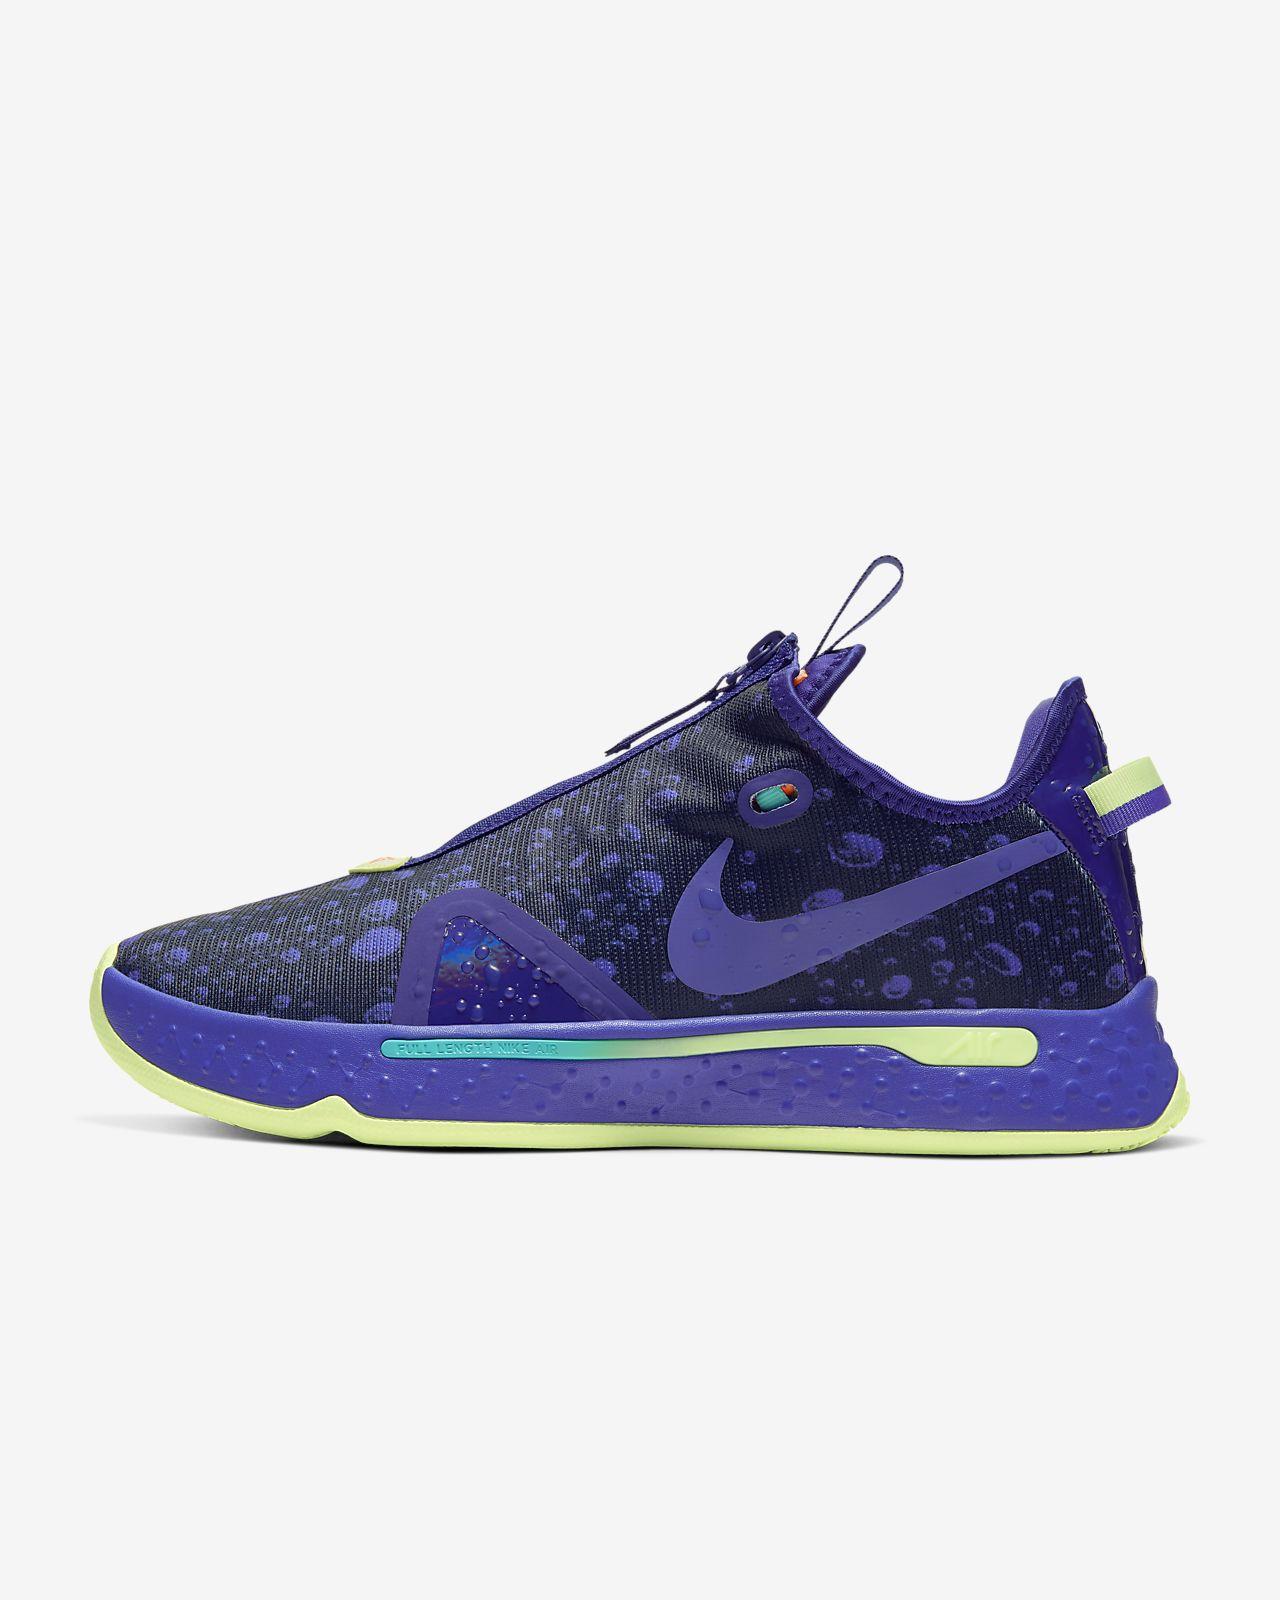 PG 4 'Gatorade' GX Basketball Shoe